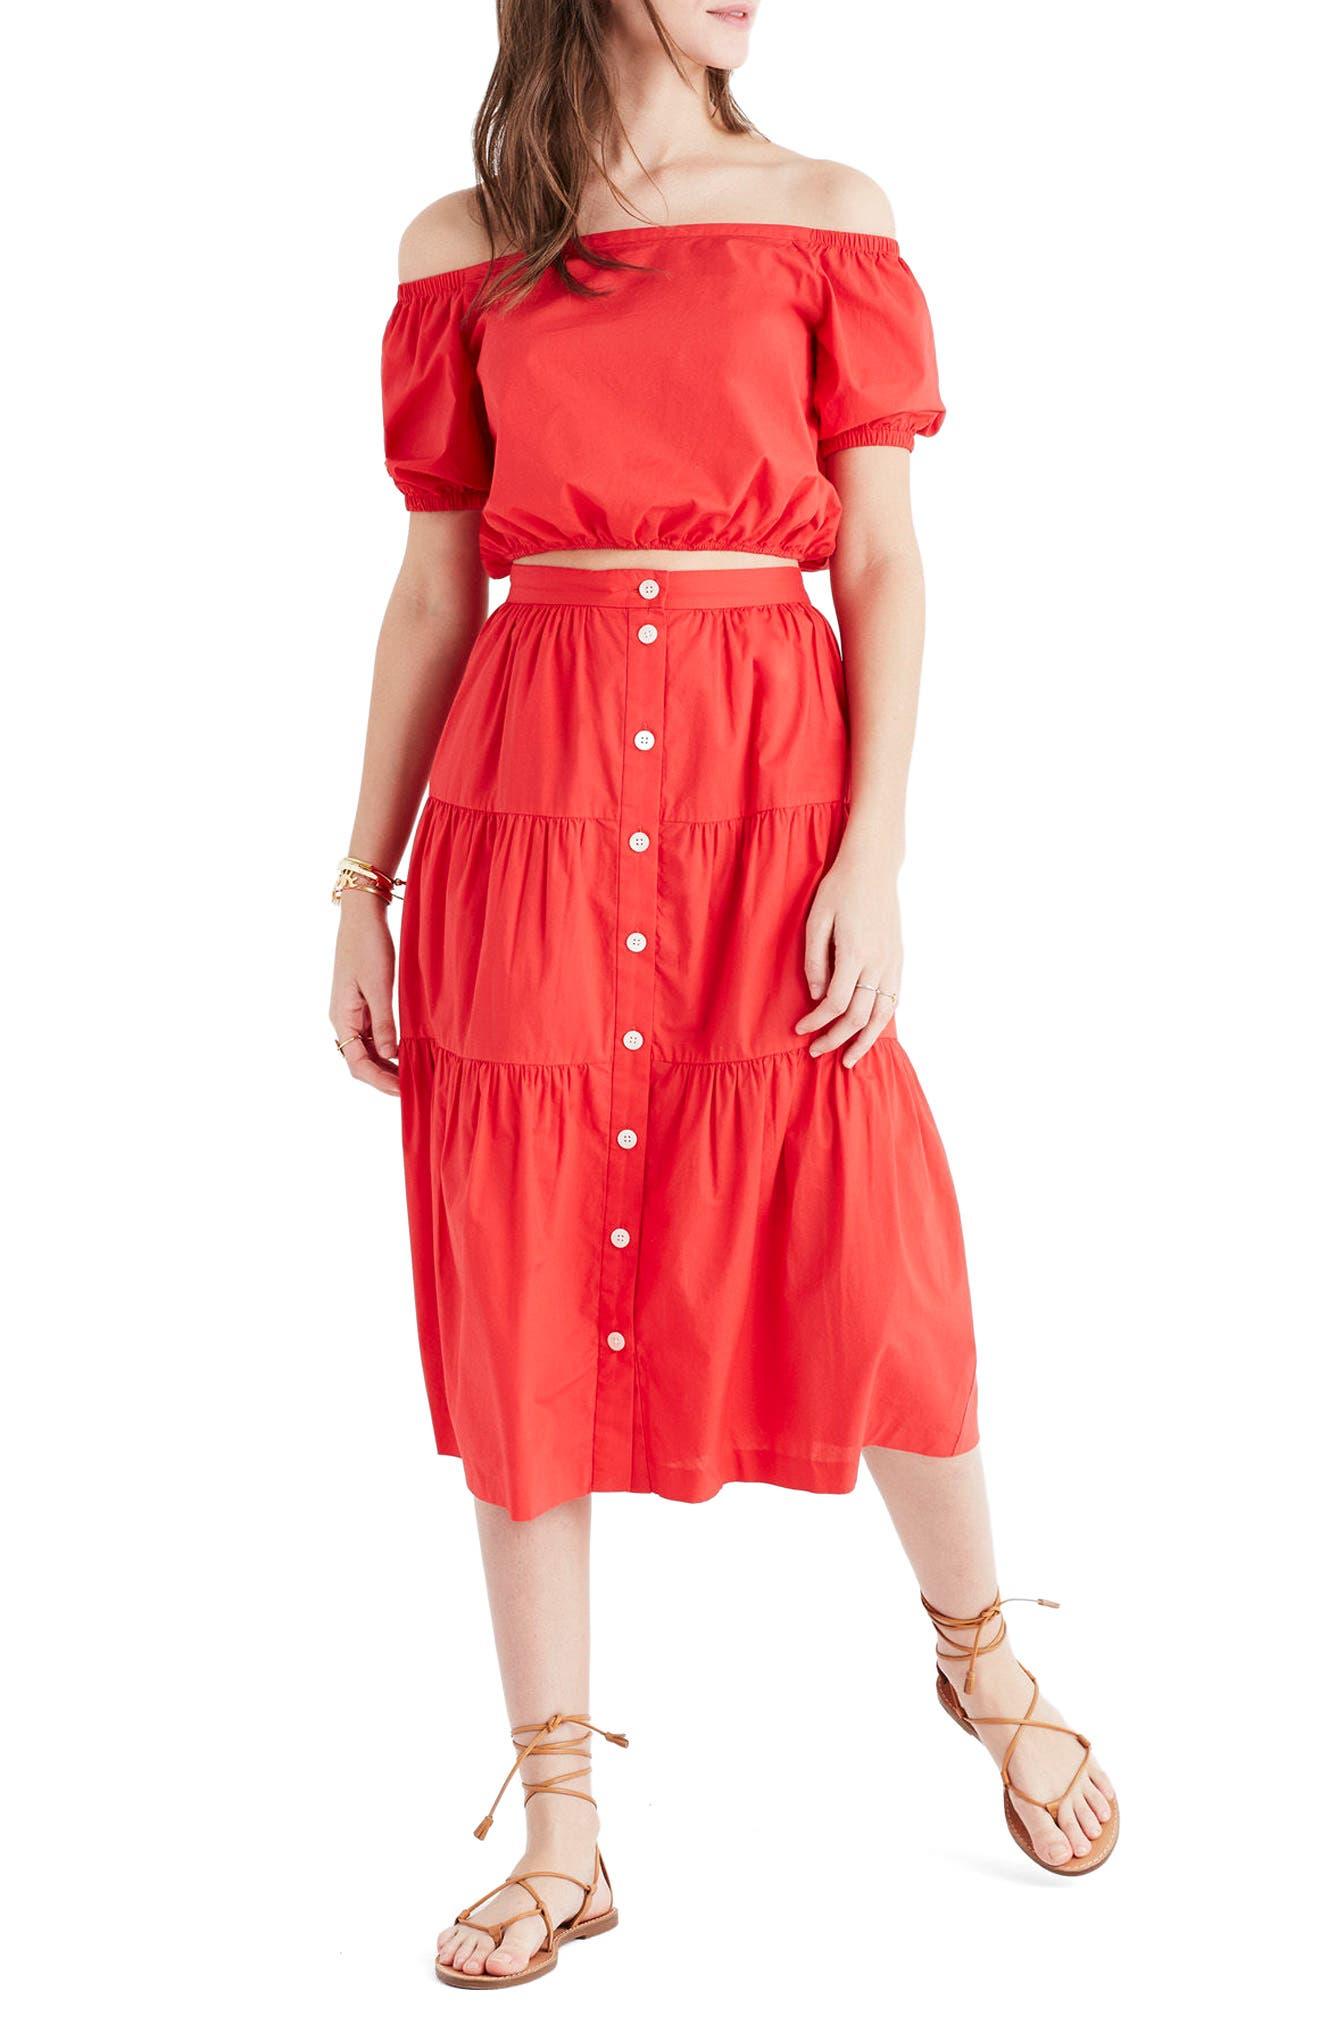 Madewell Bistro Midi Skirt